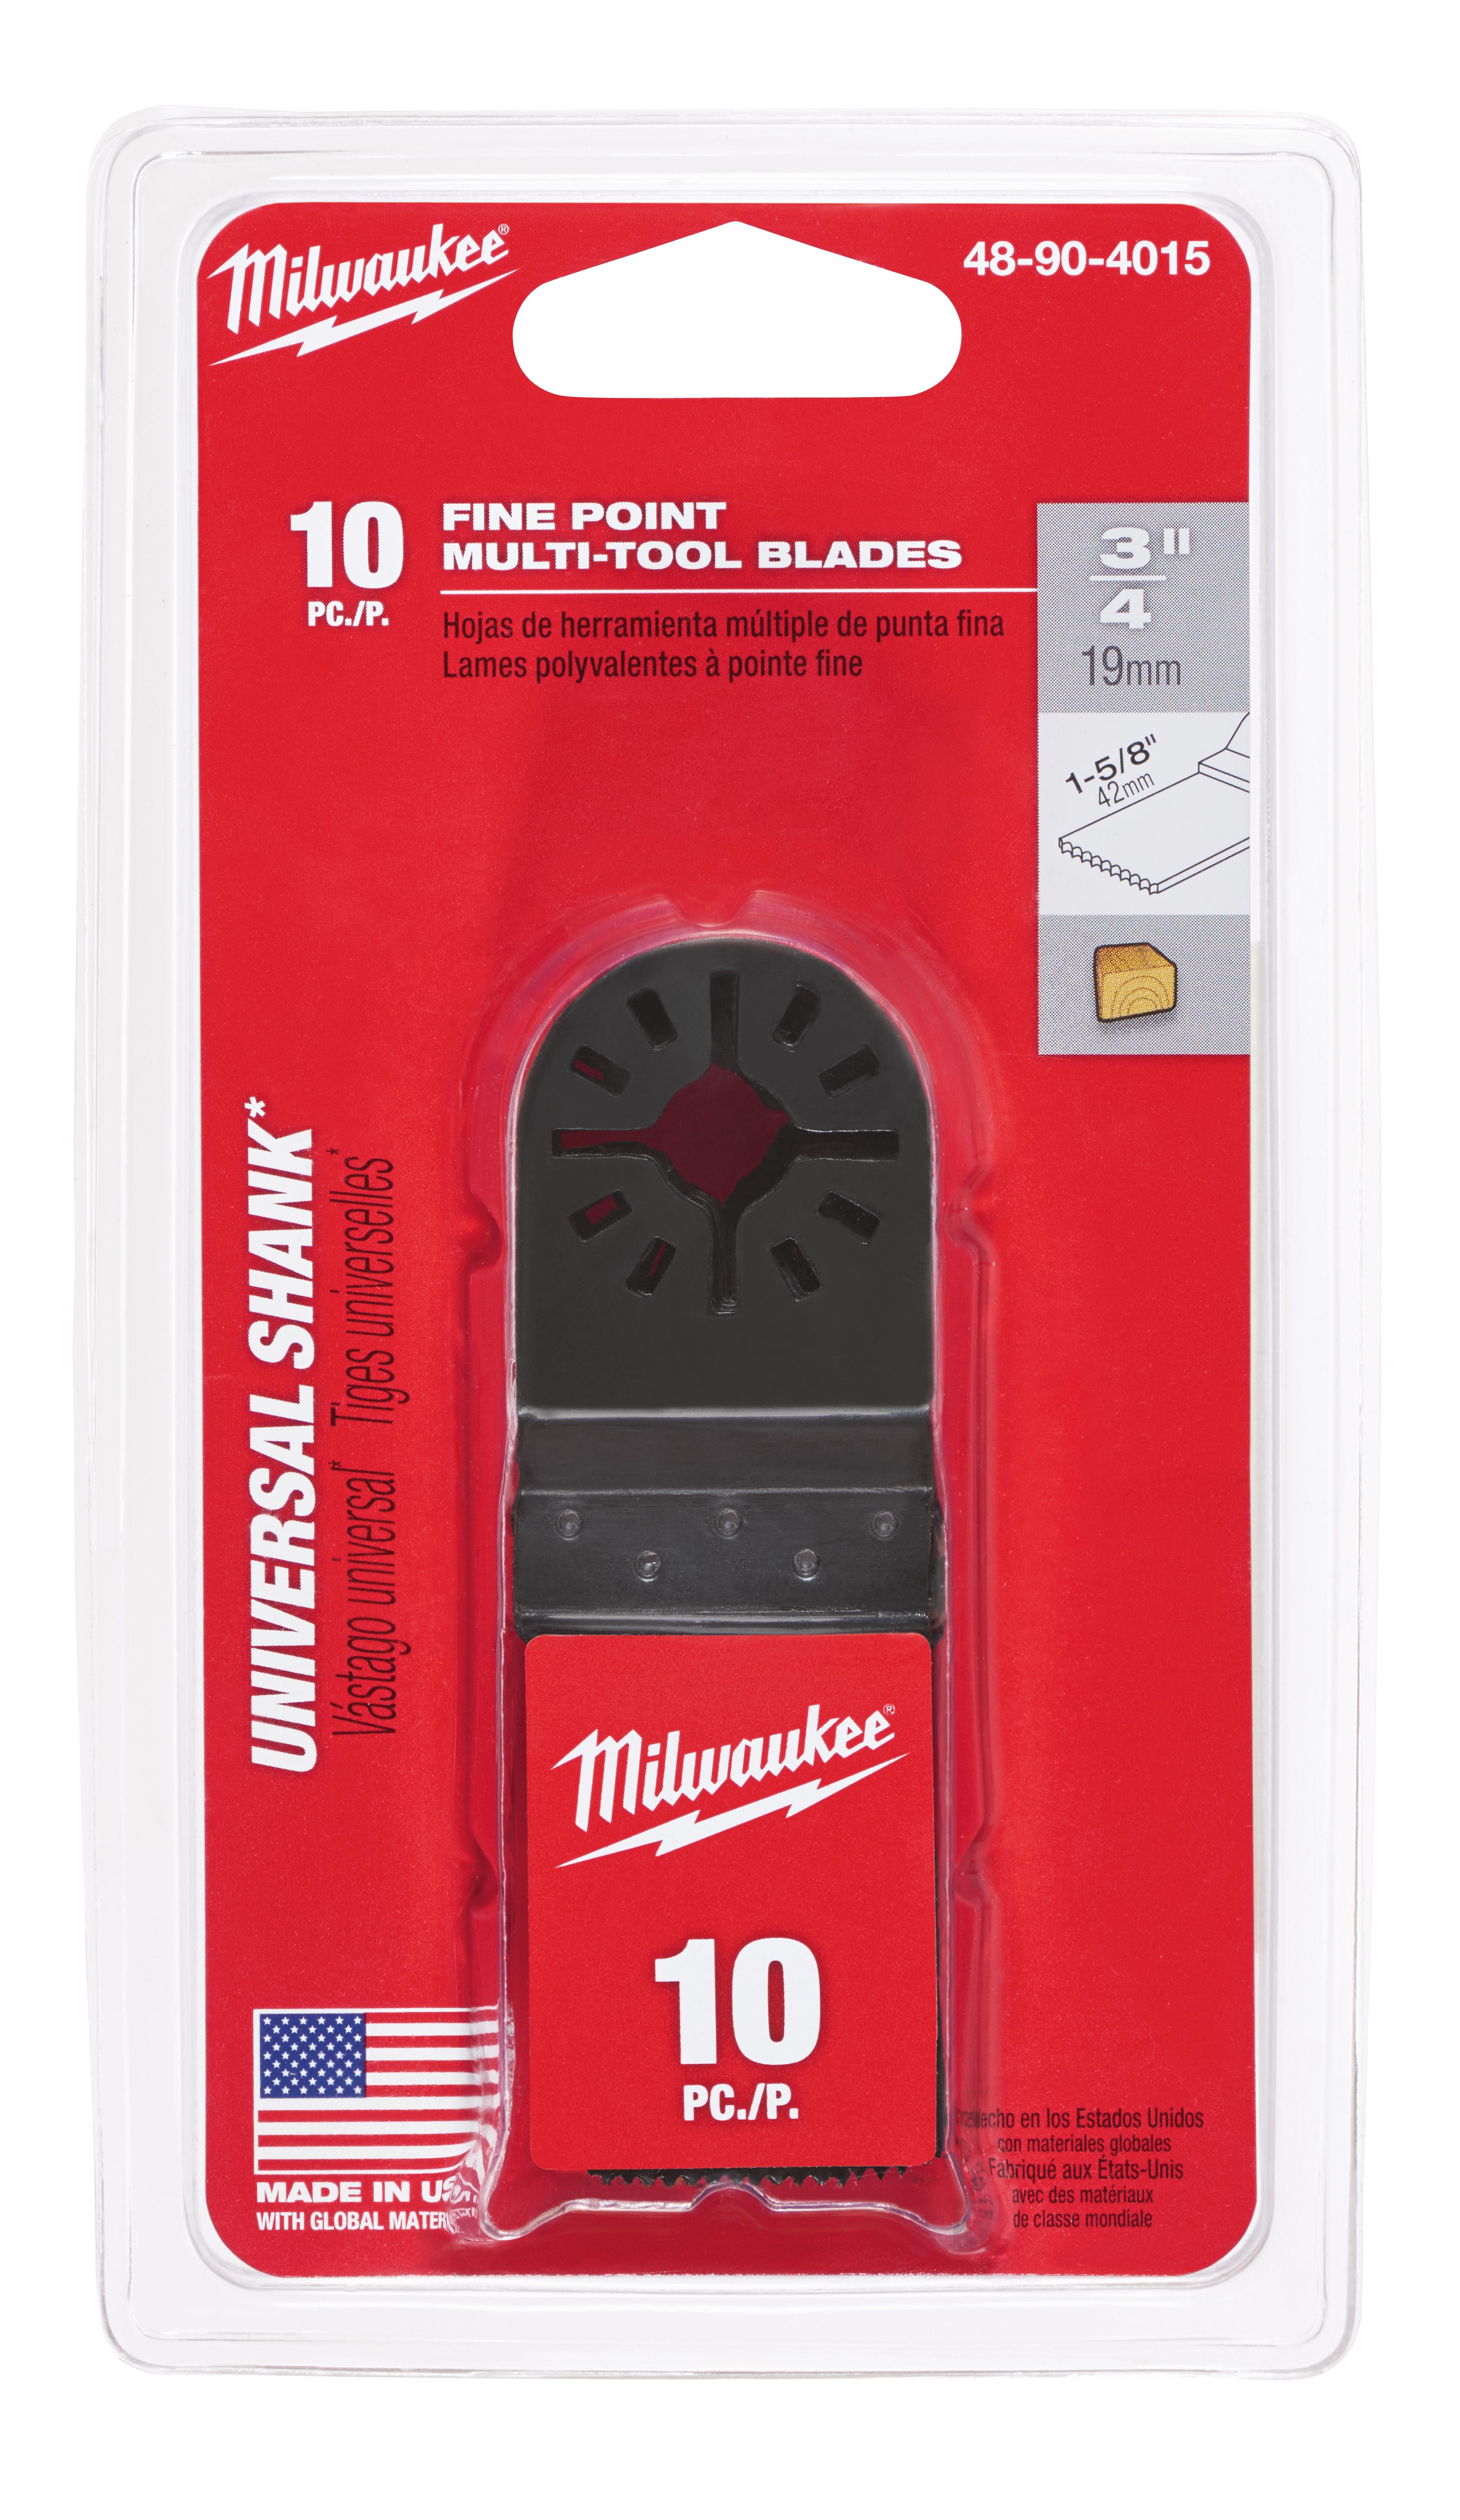 Milwaukee® 48-90-4015 Fine Point Multi-Tool Blade With Universal Shank, For Use With Milwaukee®, Bosch® (Non-Starlock™), SKIL®, Makita®, Craftsman®, Fein® (Non-Starlock™), Ridgid®, AEG®, Ozito® and Ryobi® Professional Grade Oscillating Multi-Tool, 3/4 in